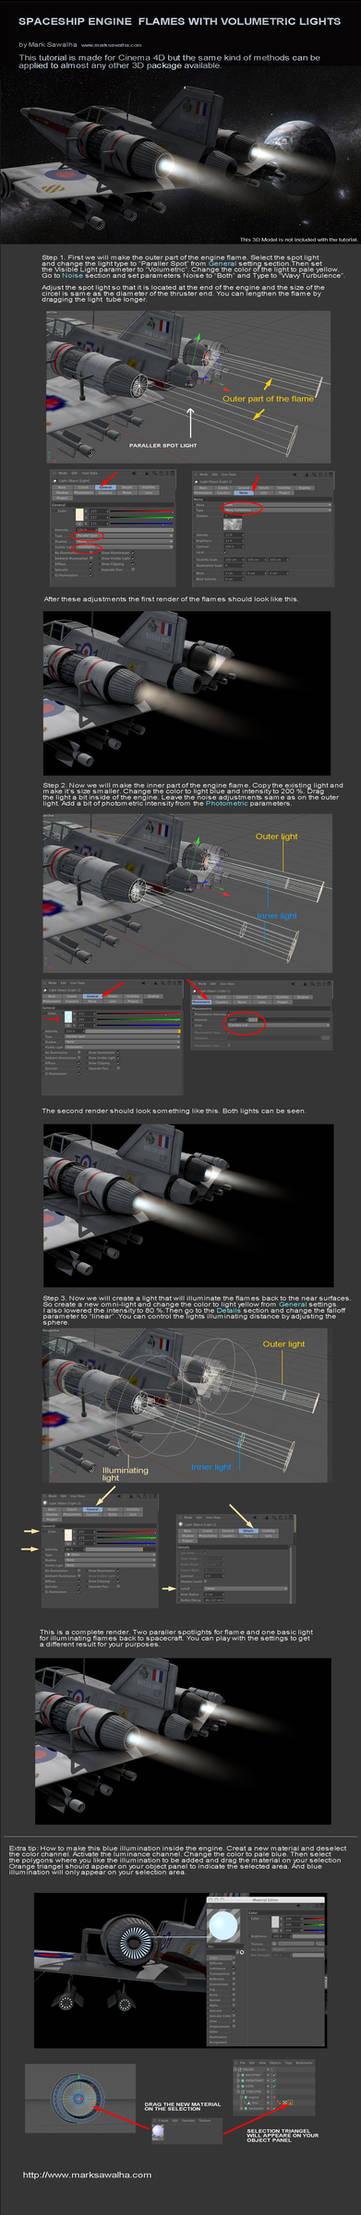 Spaceship Engine Flames With Volumetric Lights